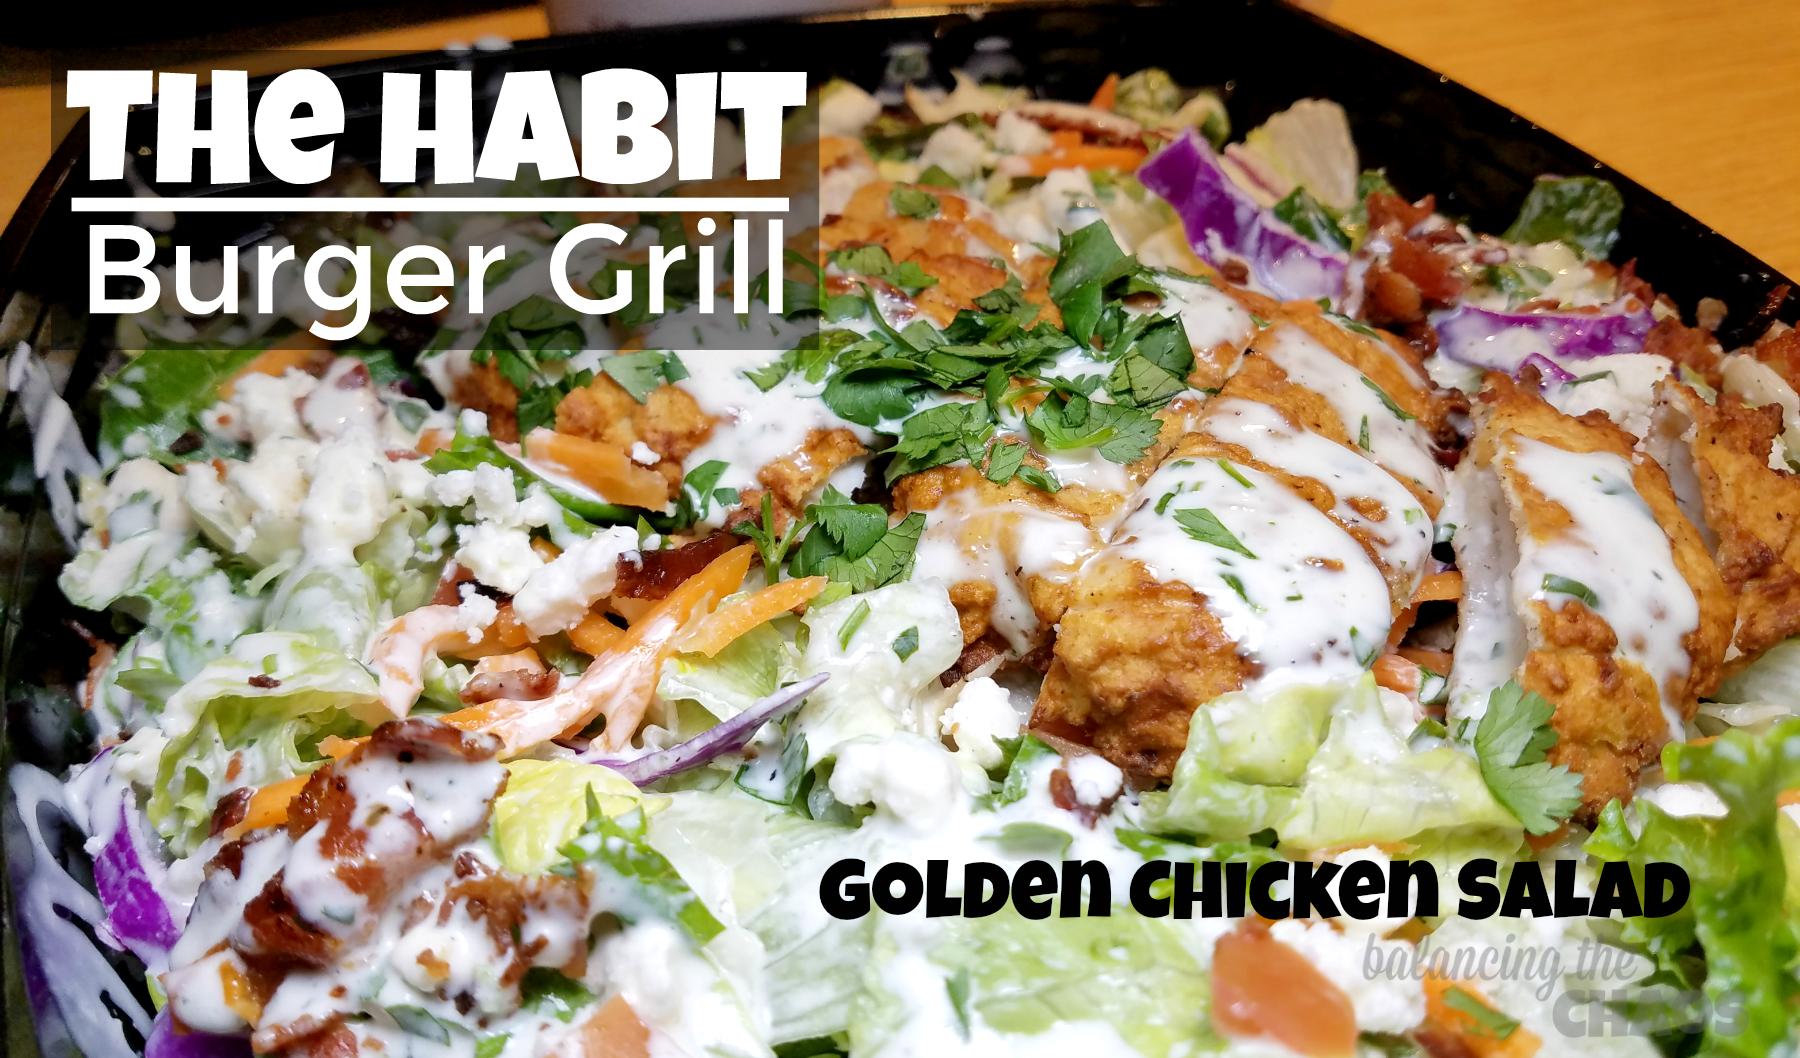 The Habit Burger Grill Golden Chicken Salad